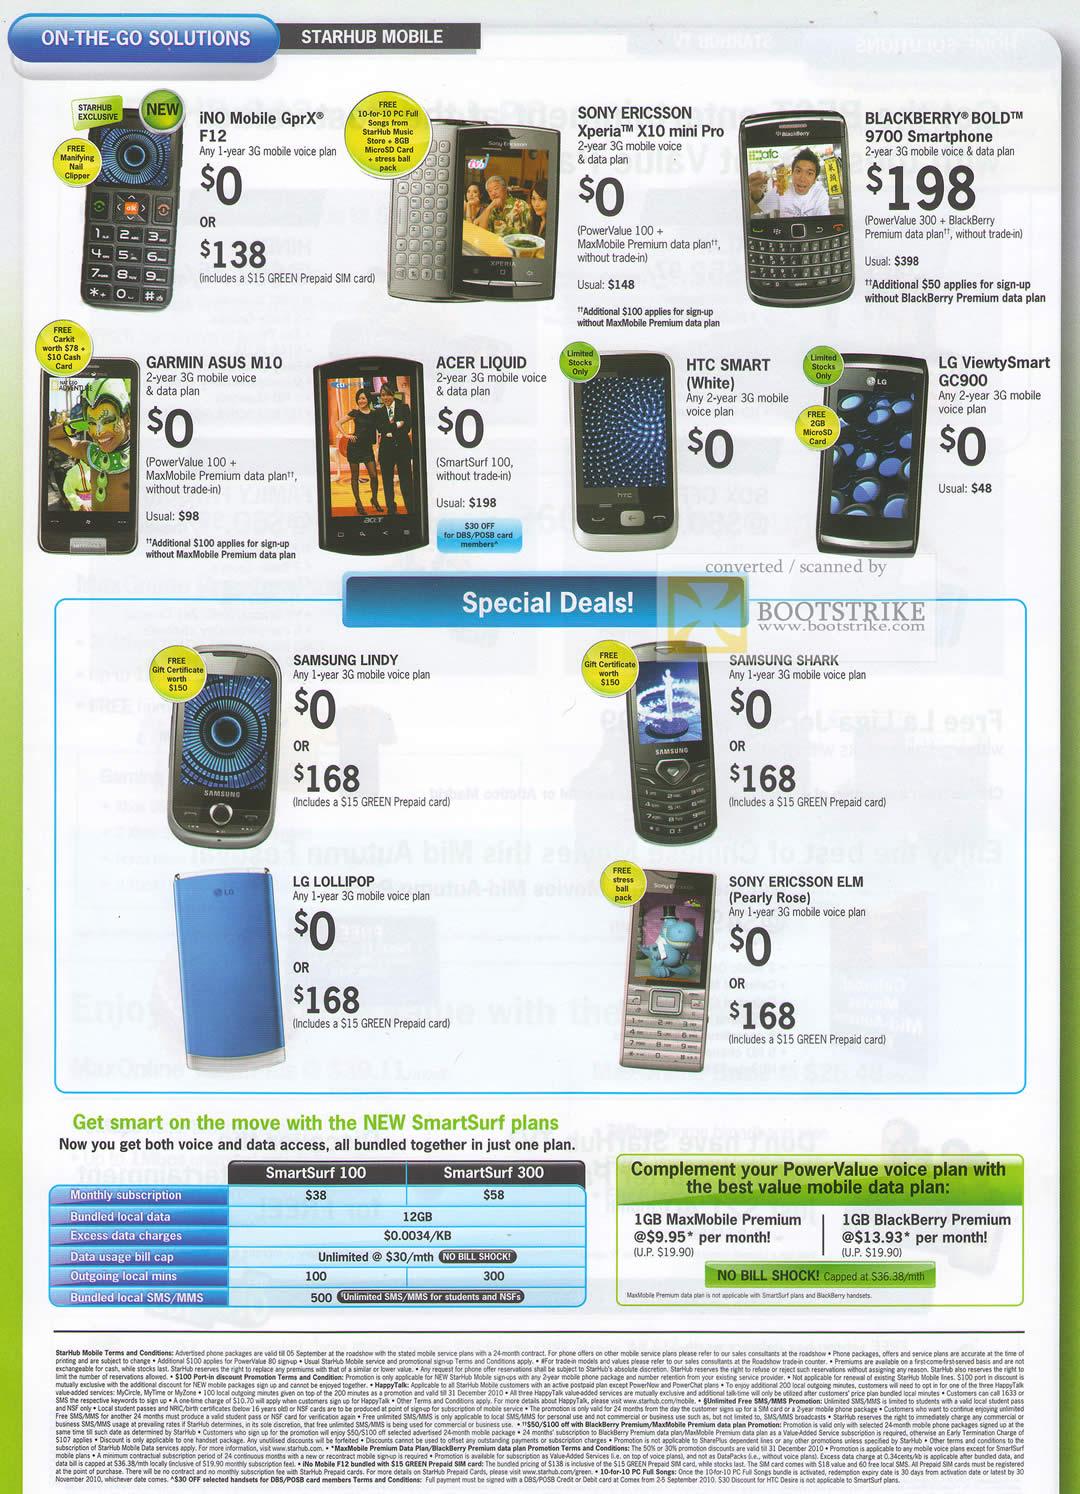 Comex 2010 price list image brochure of Starhub Mobile Phones INo Mobile GprX F12 Sony Ericsson Xperia BlackBerry Garmin ASUS Acer HTC LG SmartSurf Plans